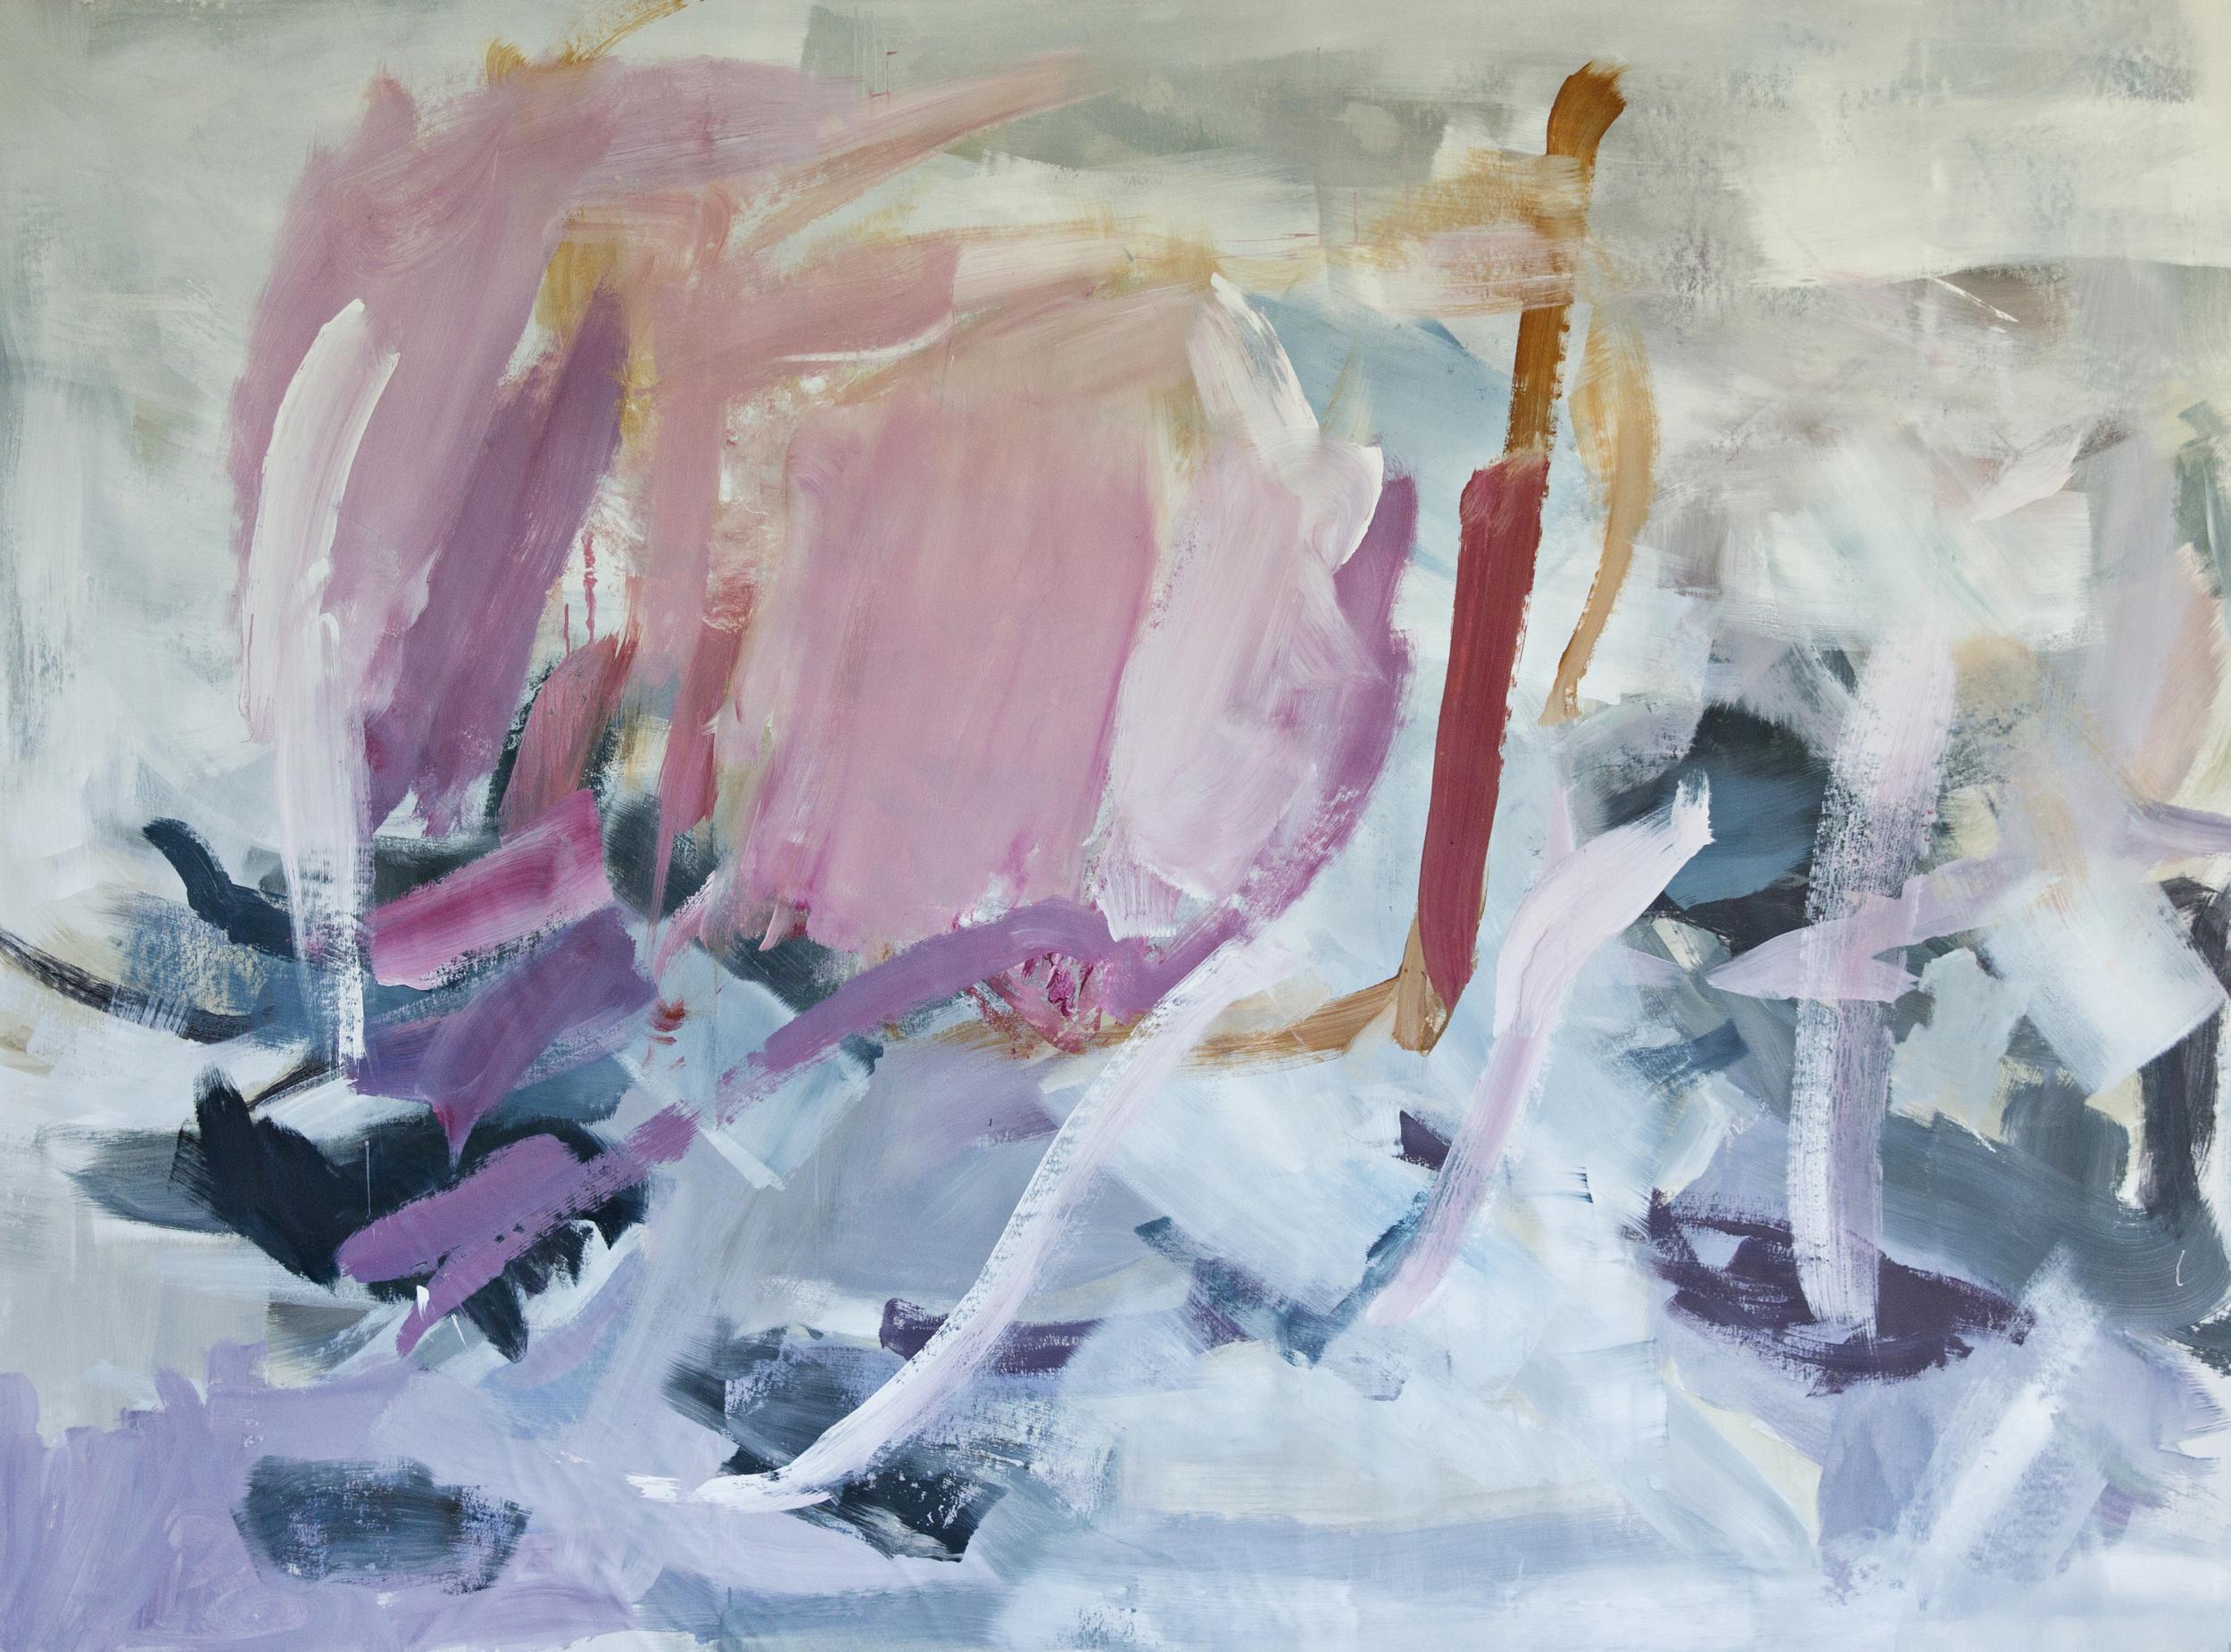 Purple Crush  68 x 91 inches  acrylic on canvas